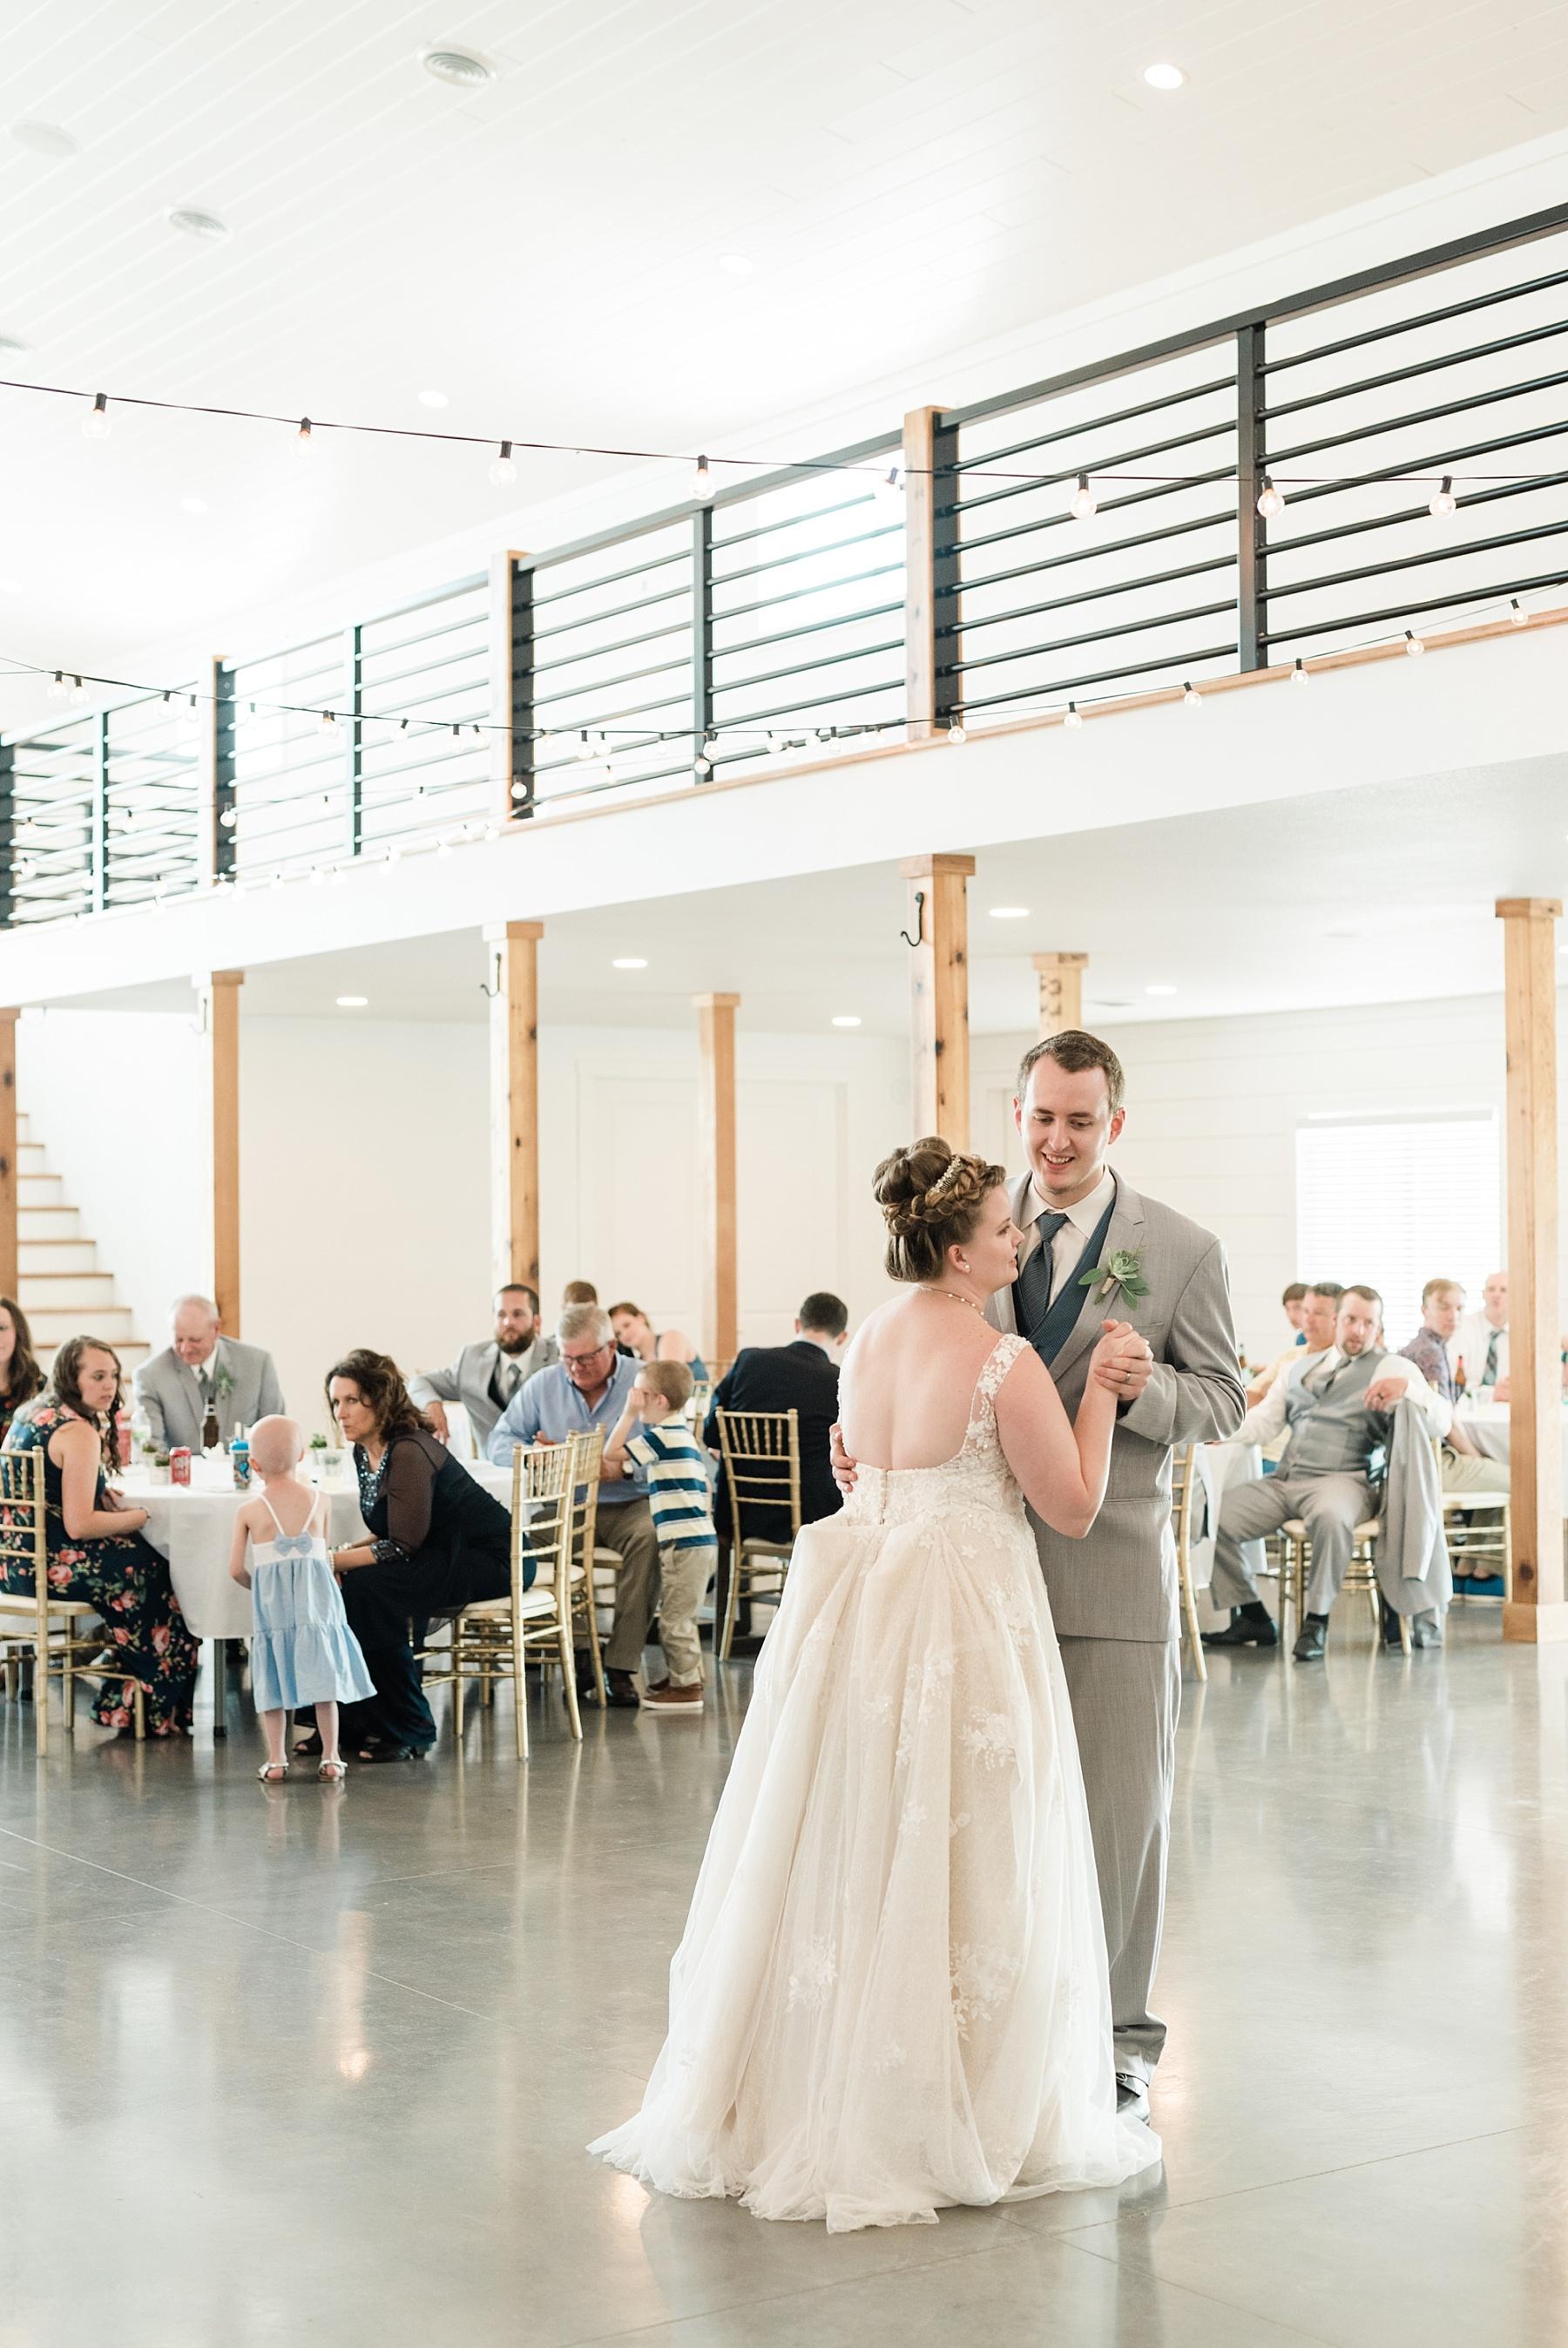 Intimate Summer Wedding at Emerson Fields by Kelsi Kliethermes Photography Best Missouri and Maui Wedding Photographer_0040.jpg